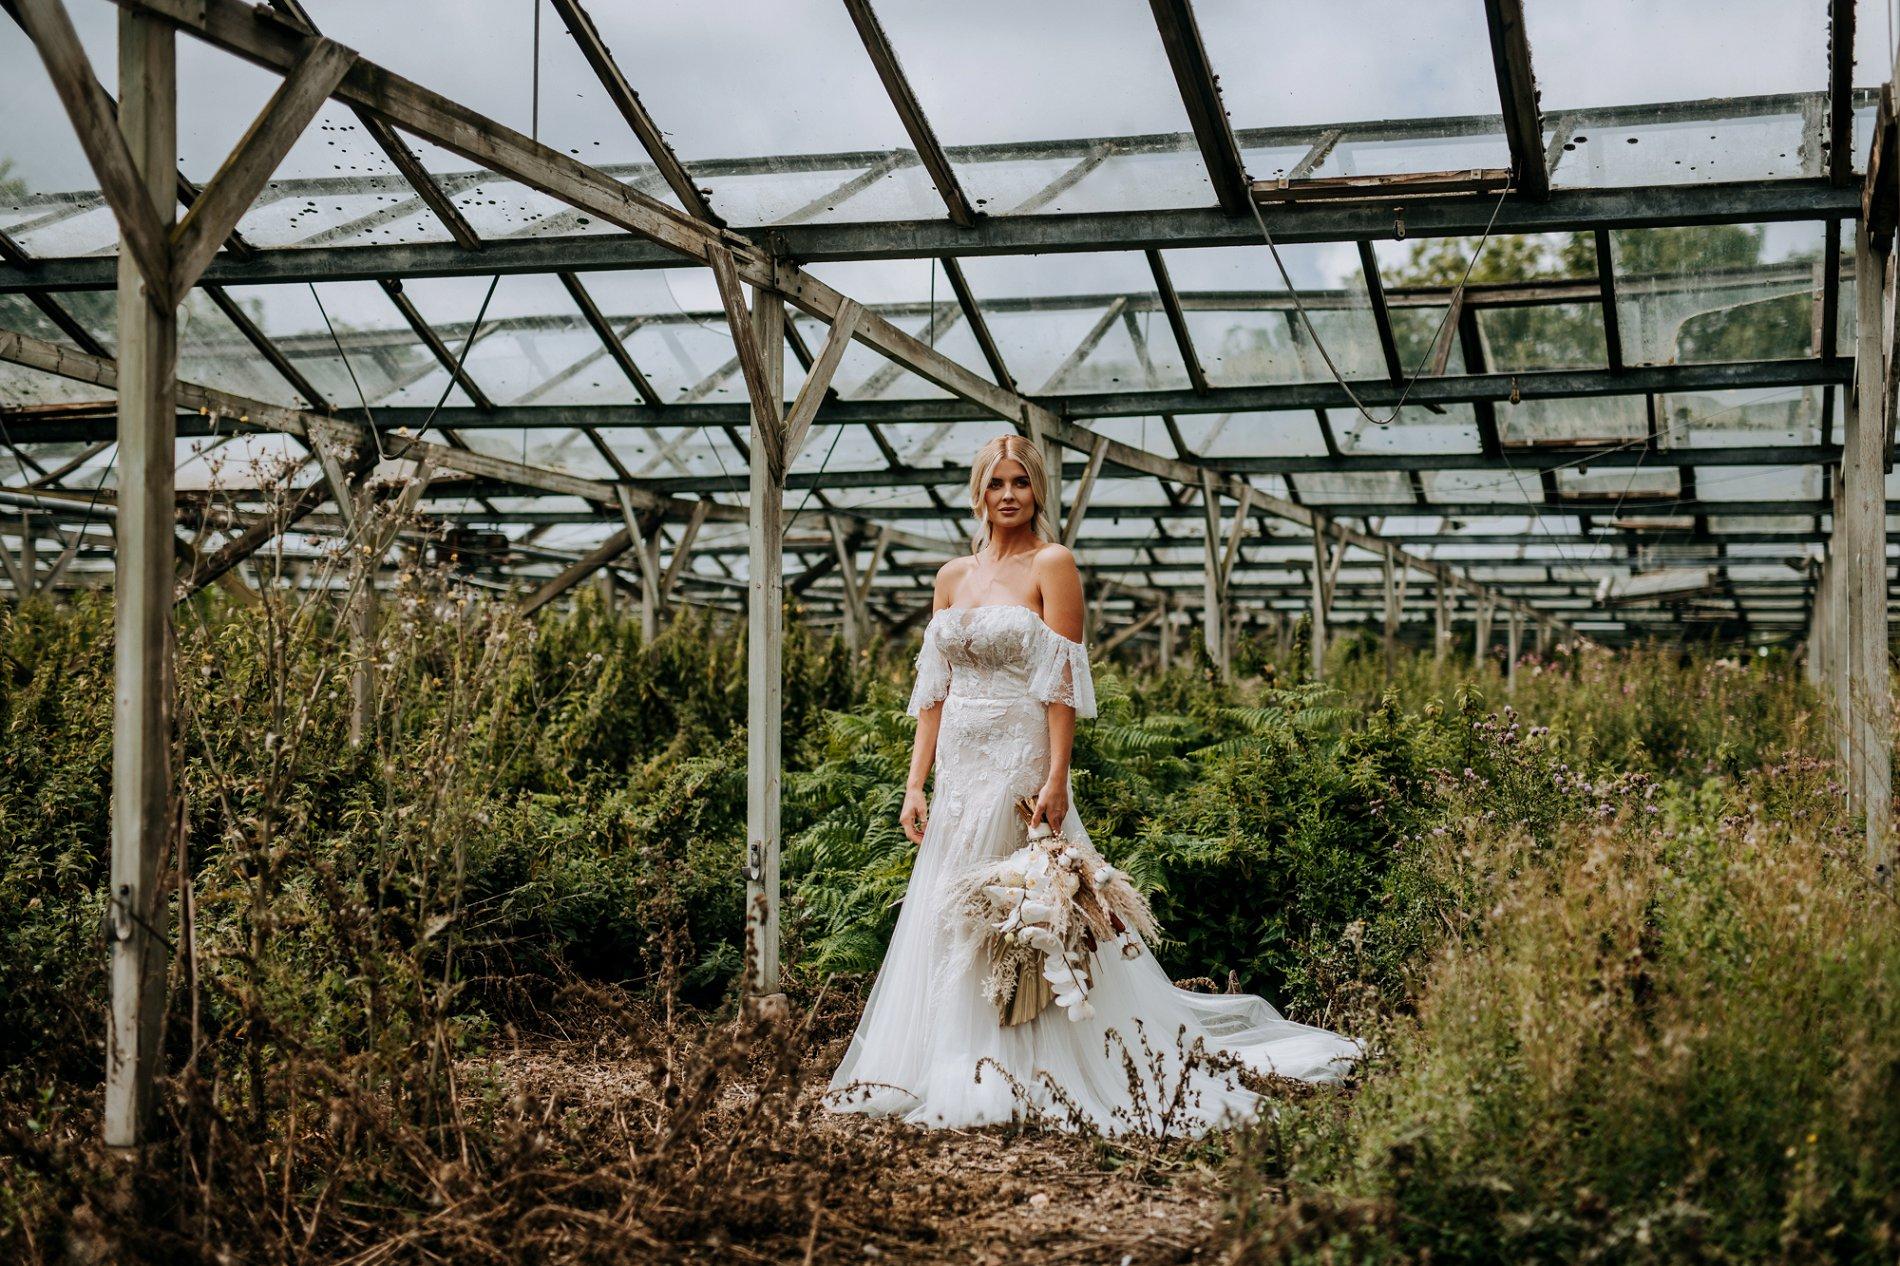 A Creative Elizabeth Lucas Bridal Fashion Editorial in Yorkshire (c) M and G Wedding Photography (6)